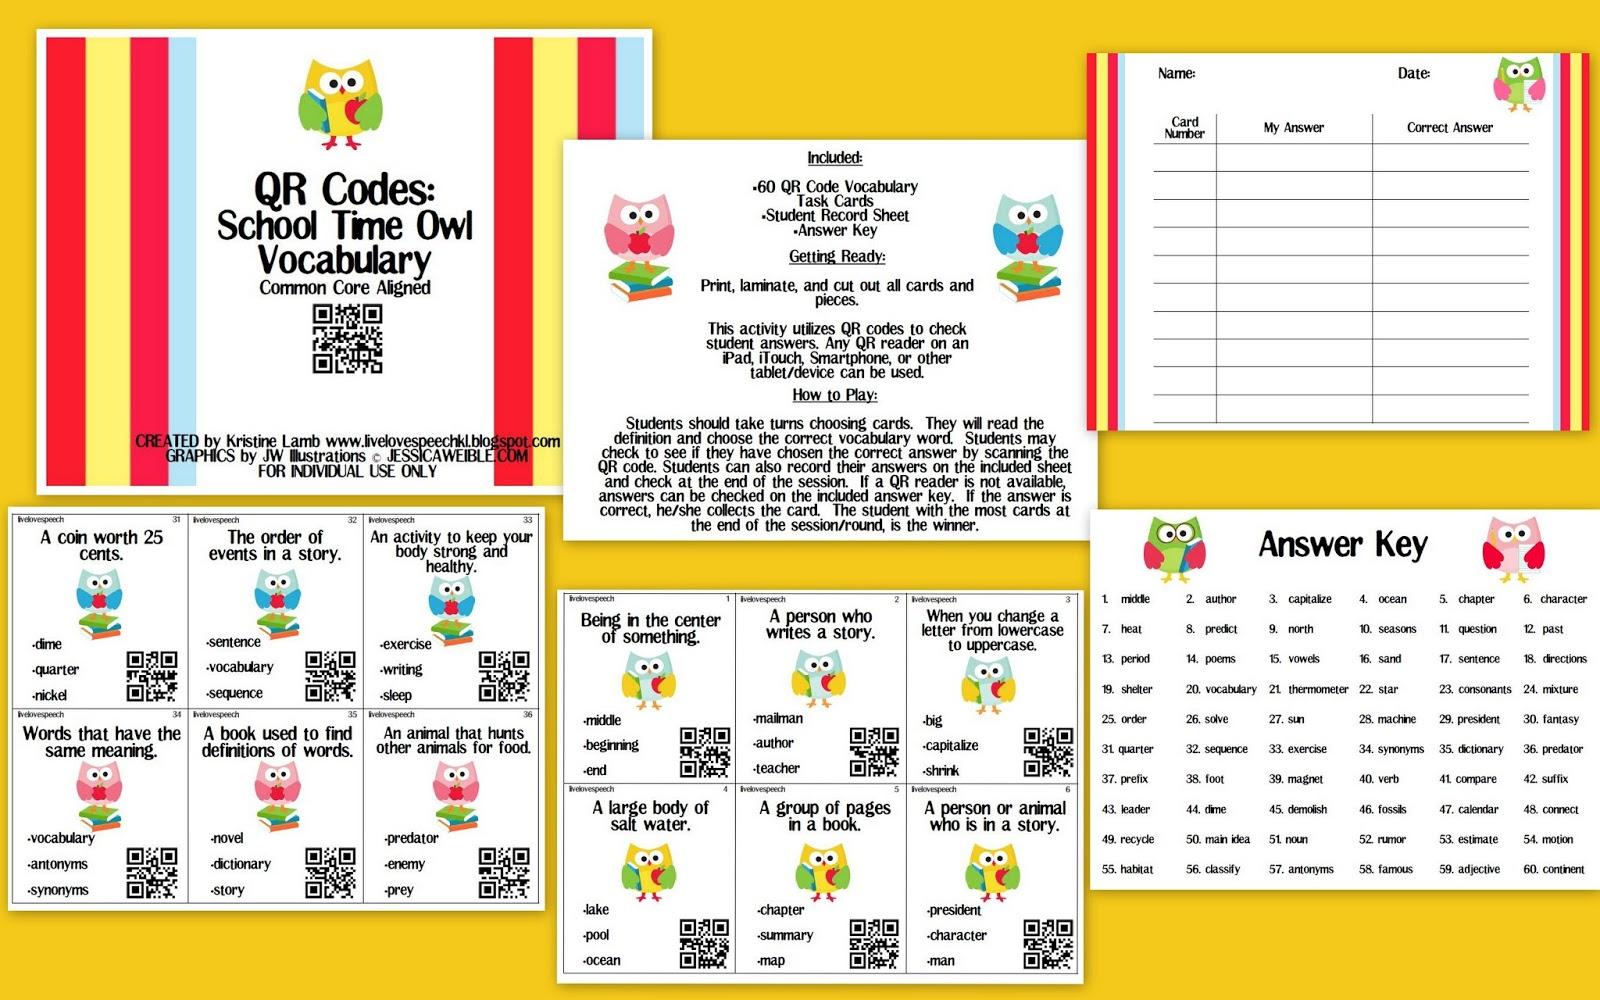 Live Love Speech Qr Codes School Time Owl Vocabulary